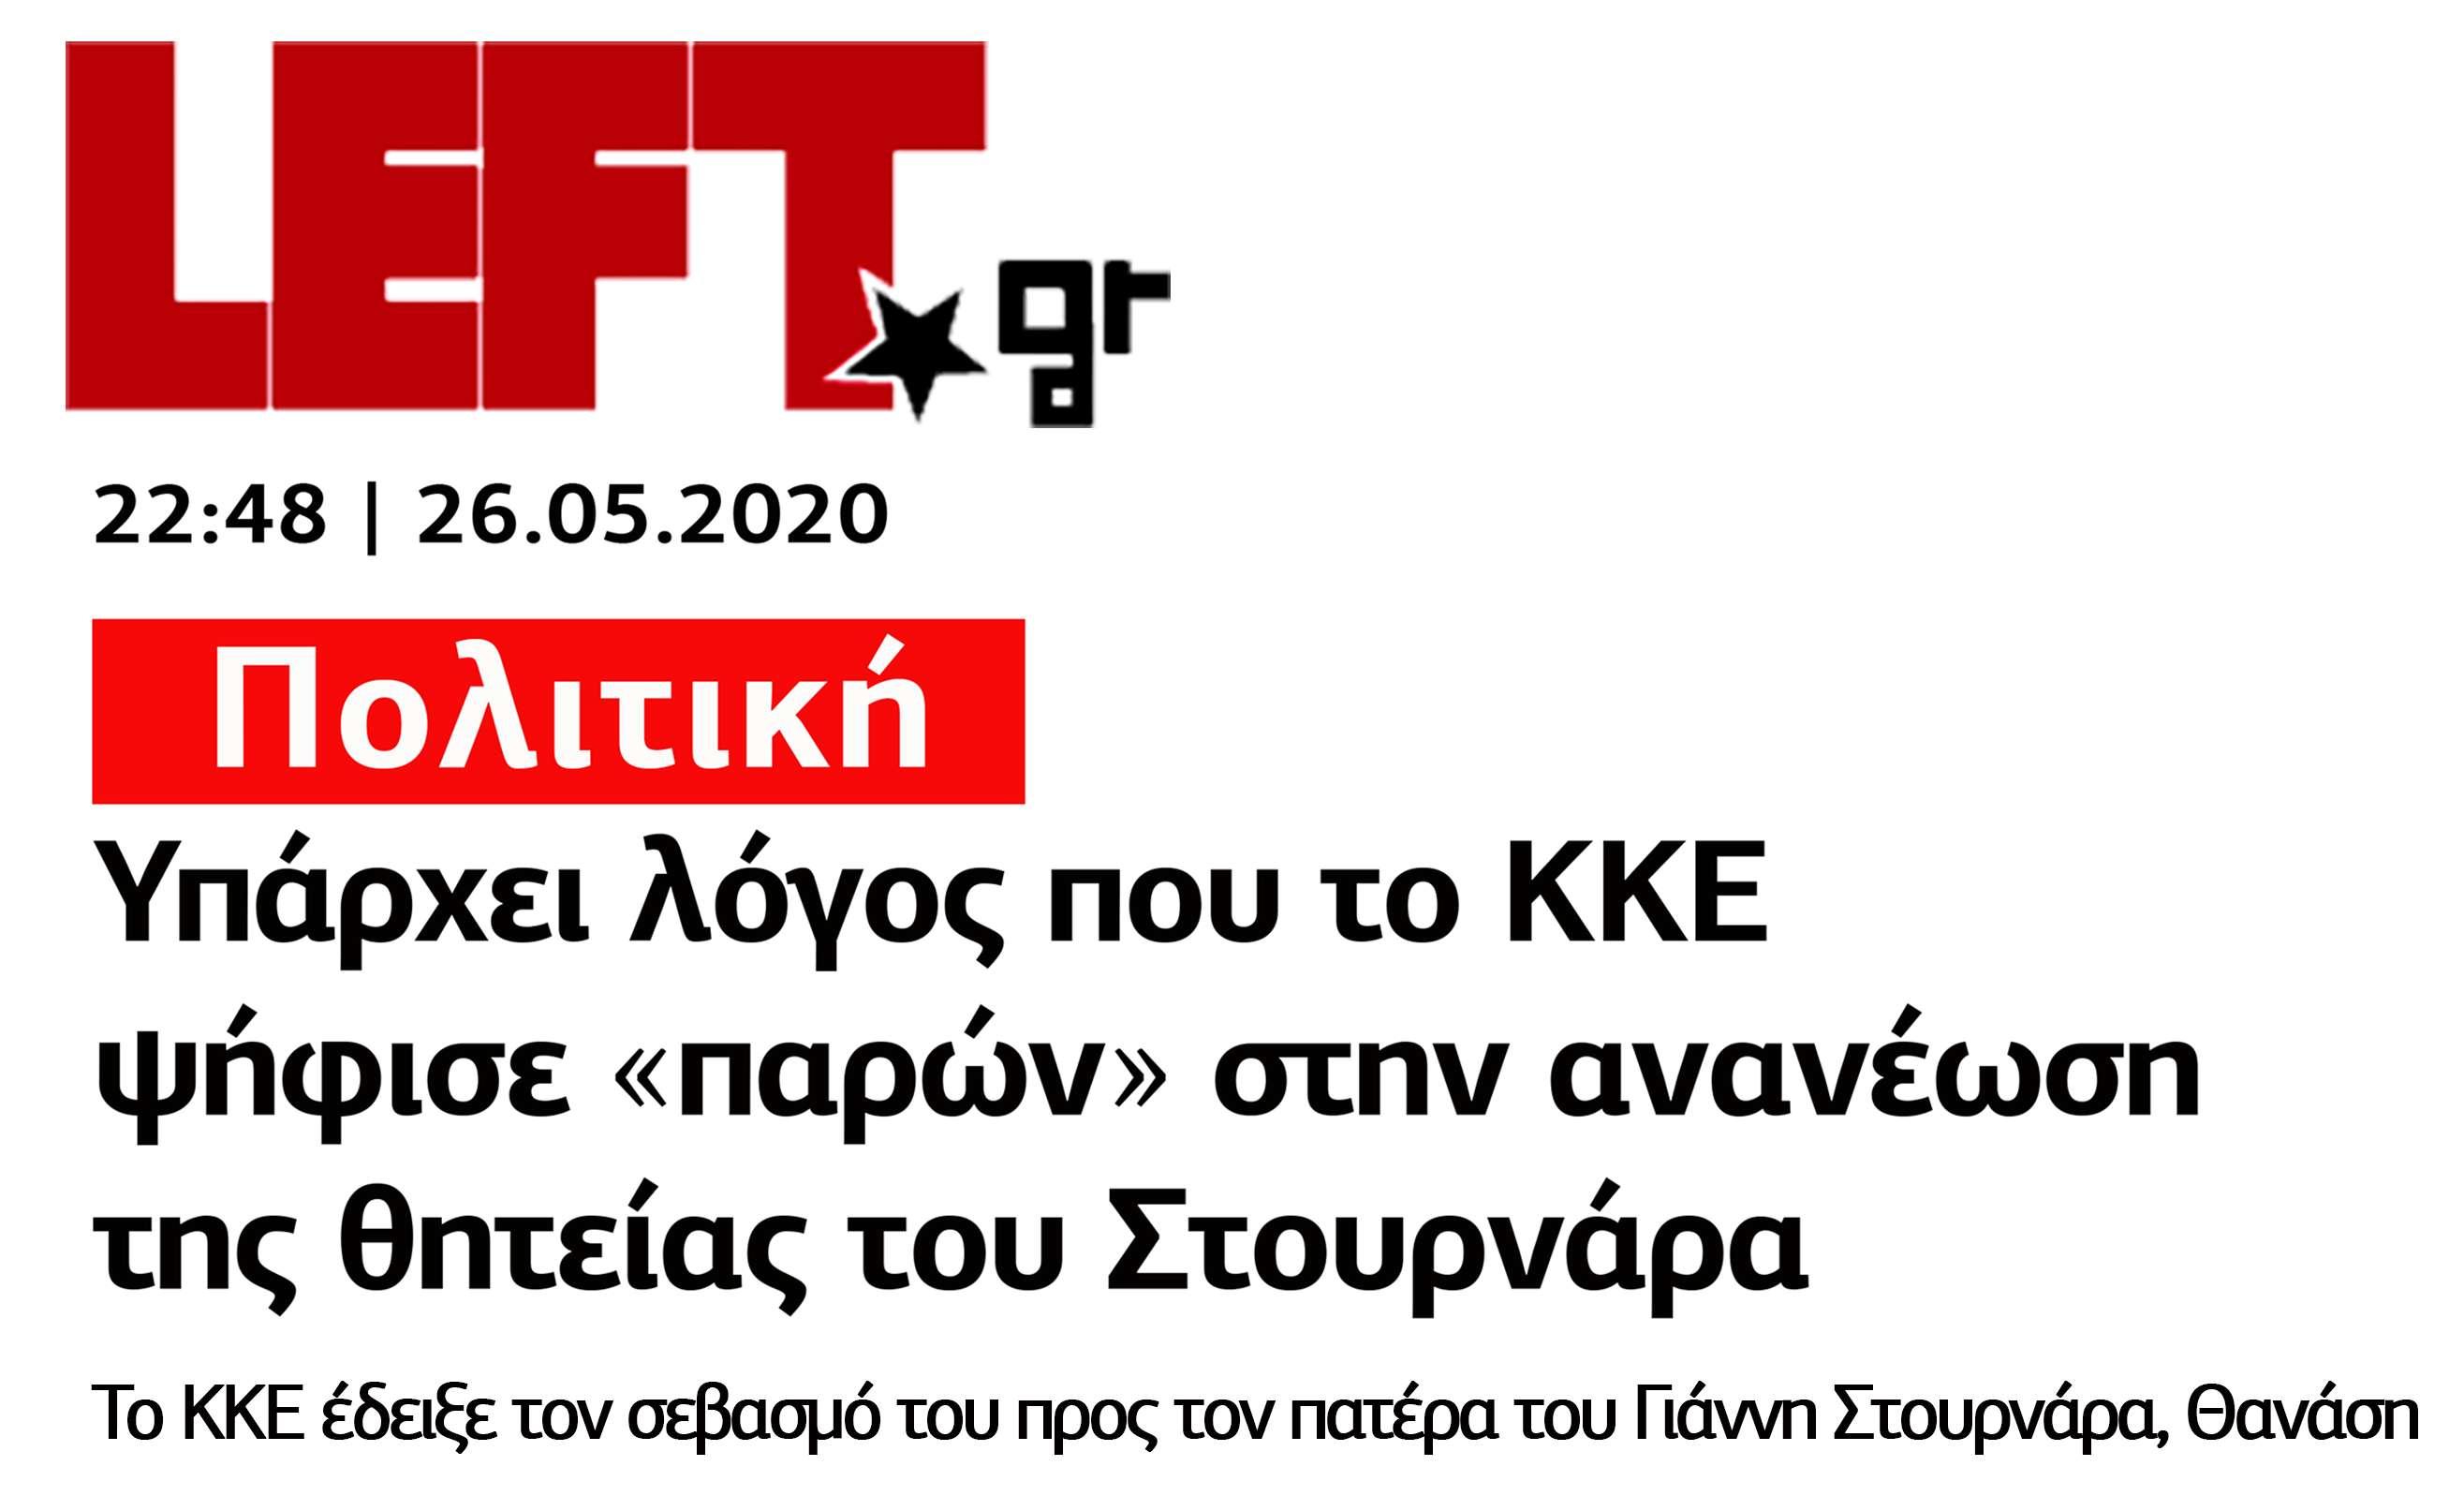 Left gr Στουρνάρας ΚΚΕ - Μπουρδολογία ή γκαιμπελισμός